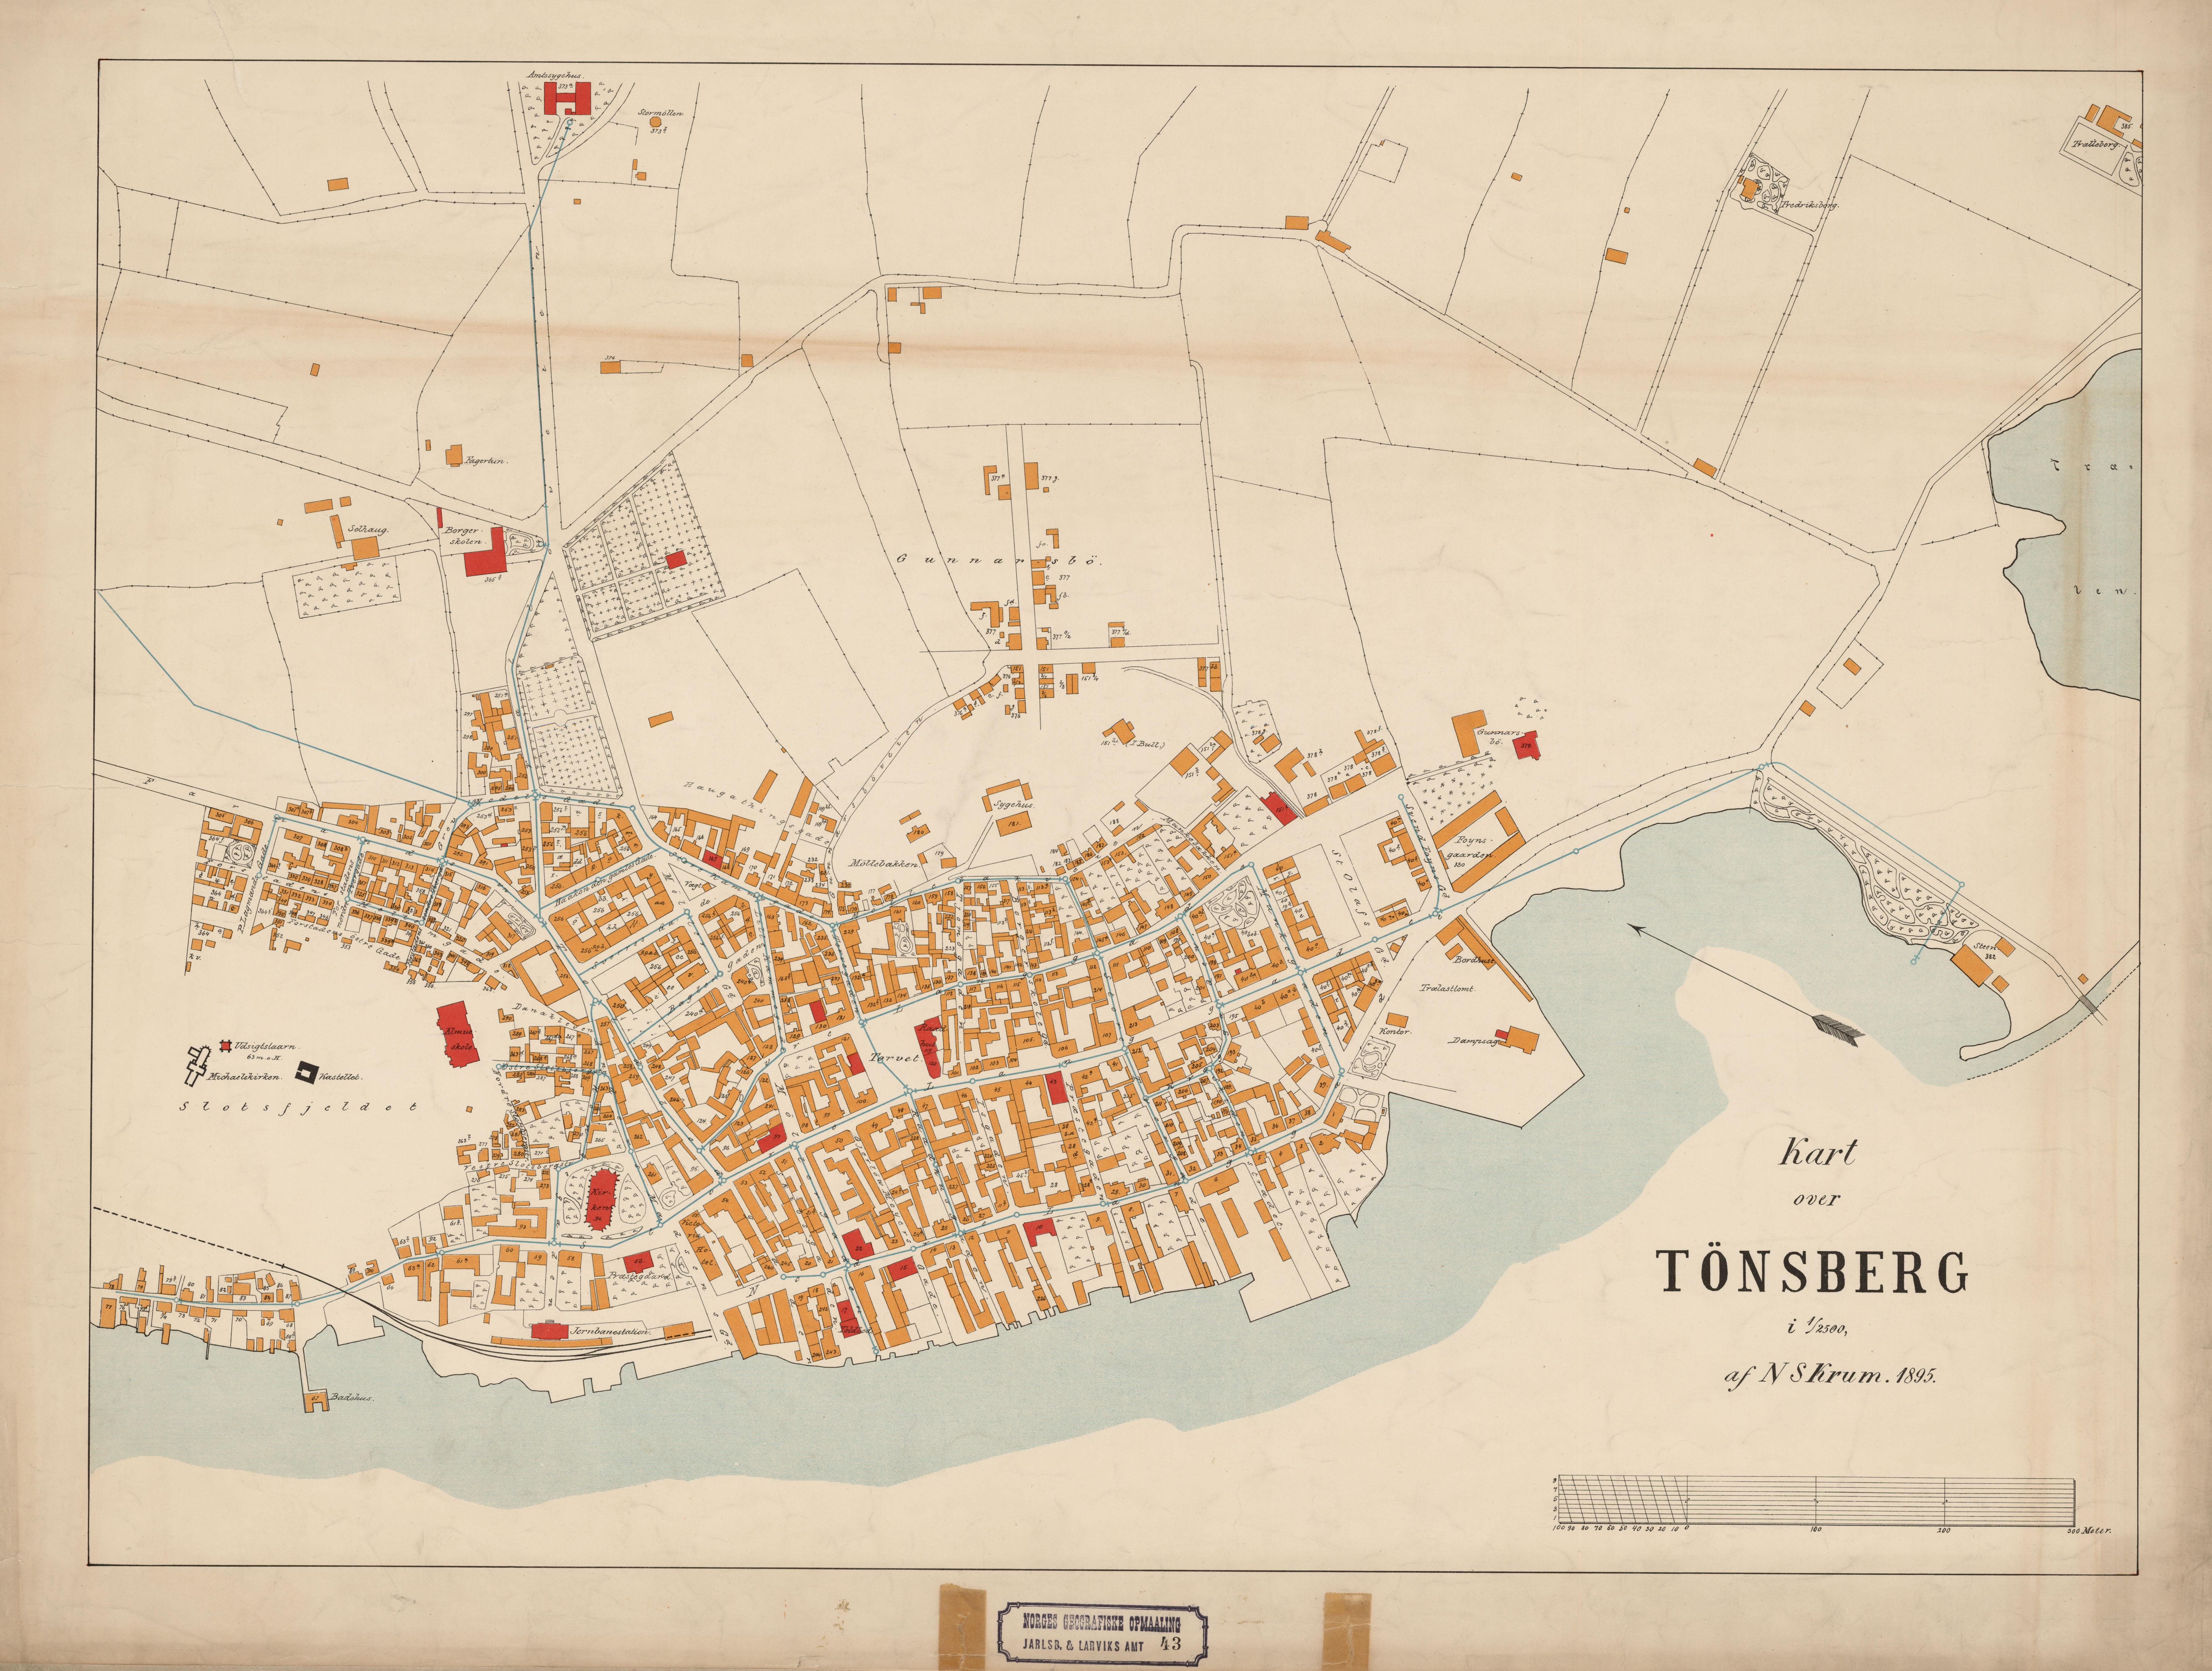 File Jarlsberg Og Larviks Amt Nr 43 Kart Over Tonsberg 1895 Jpg